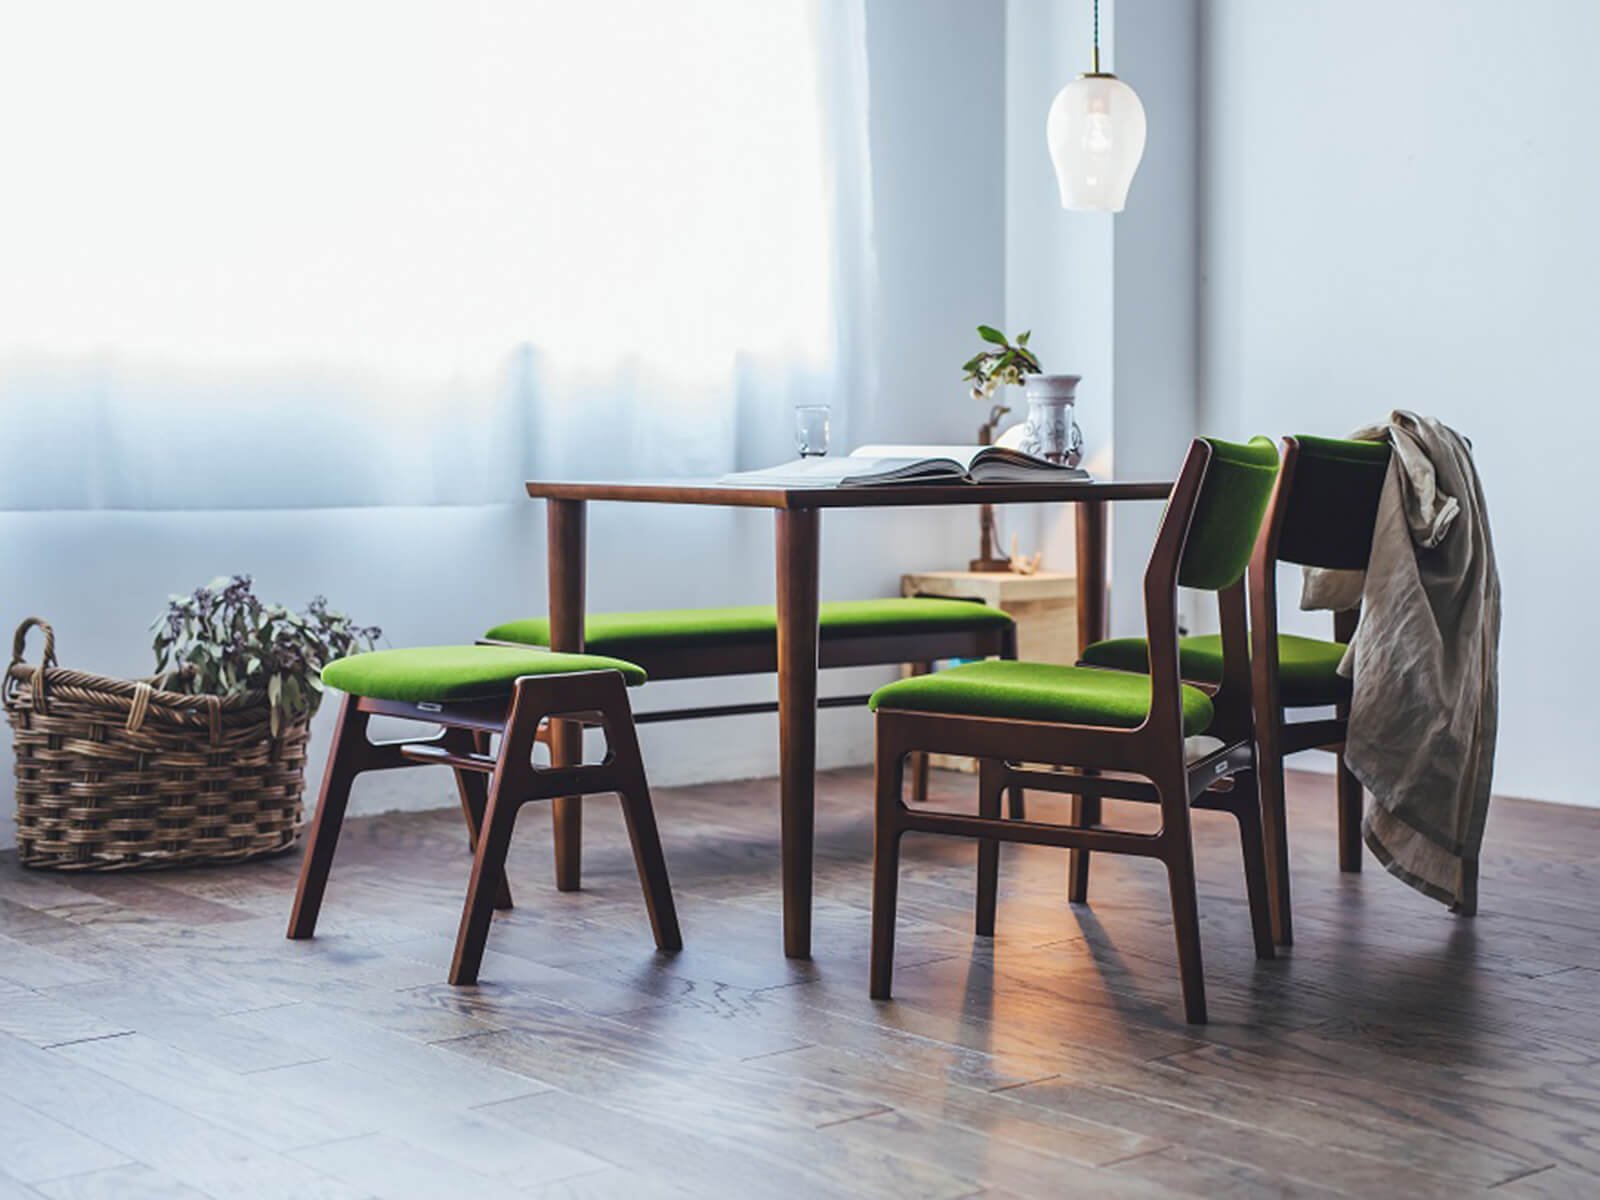 karimoku日本家具品牌 餐廳桌椅